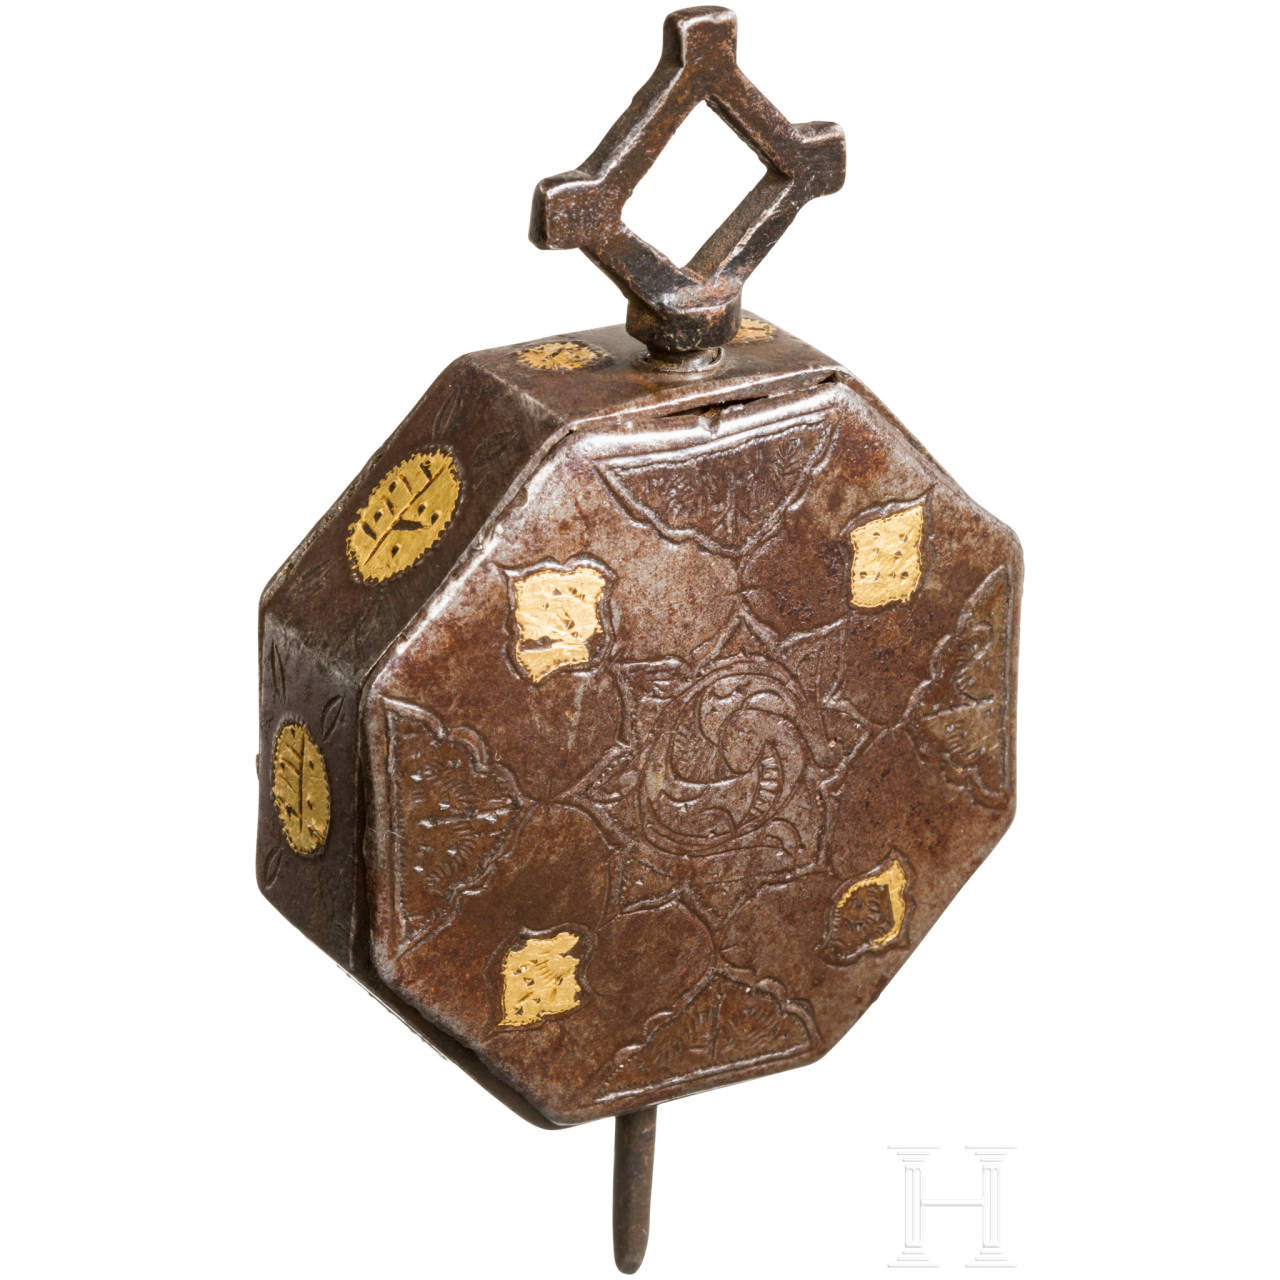 Amulettbehälter, osmanisch, 19. Jhdt.